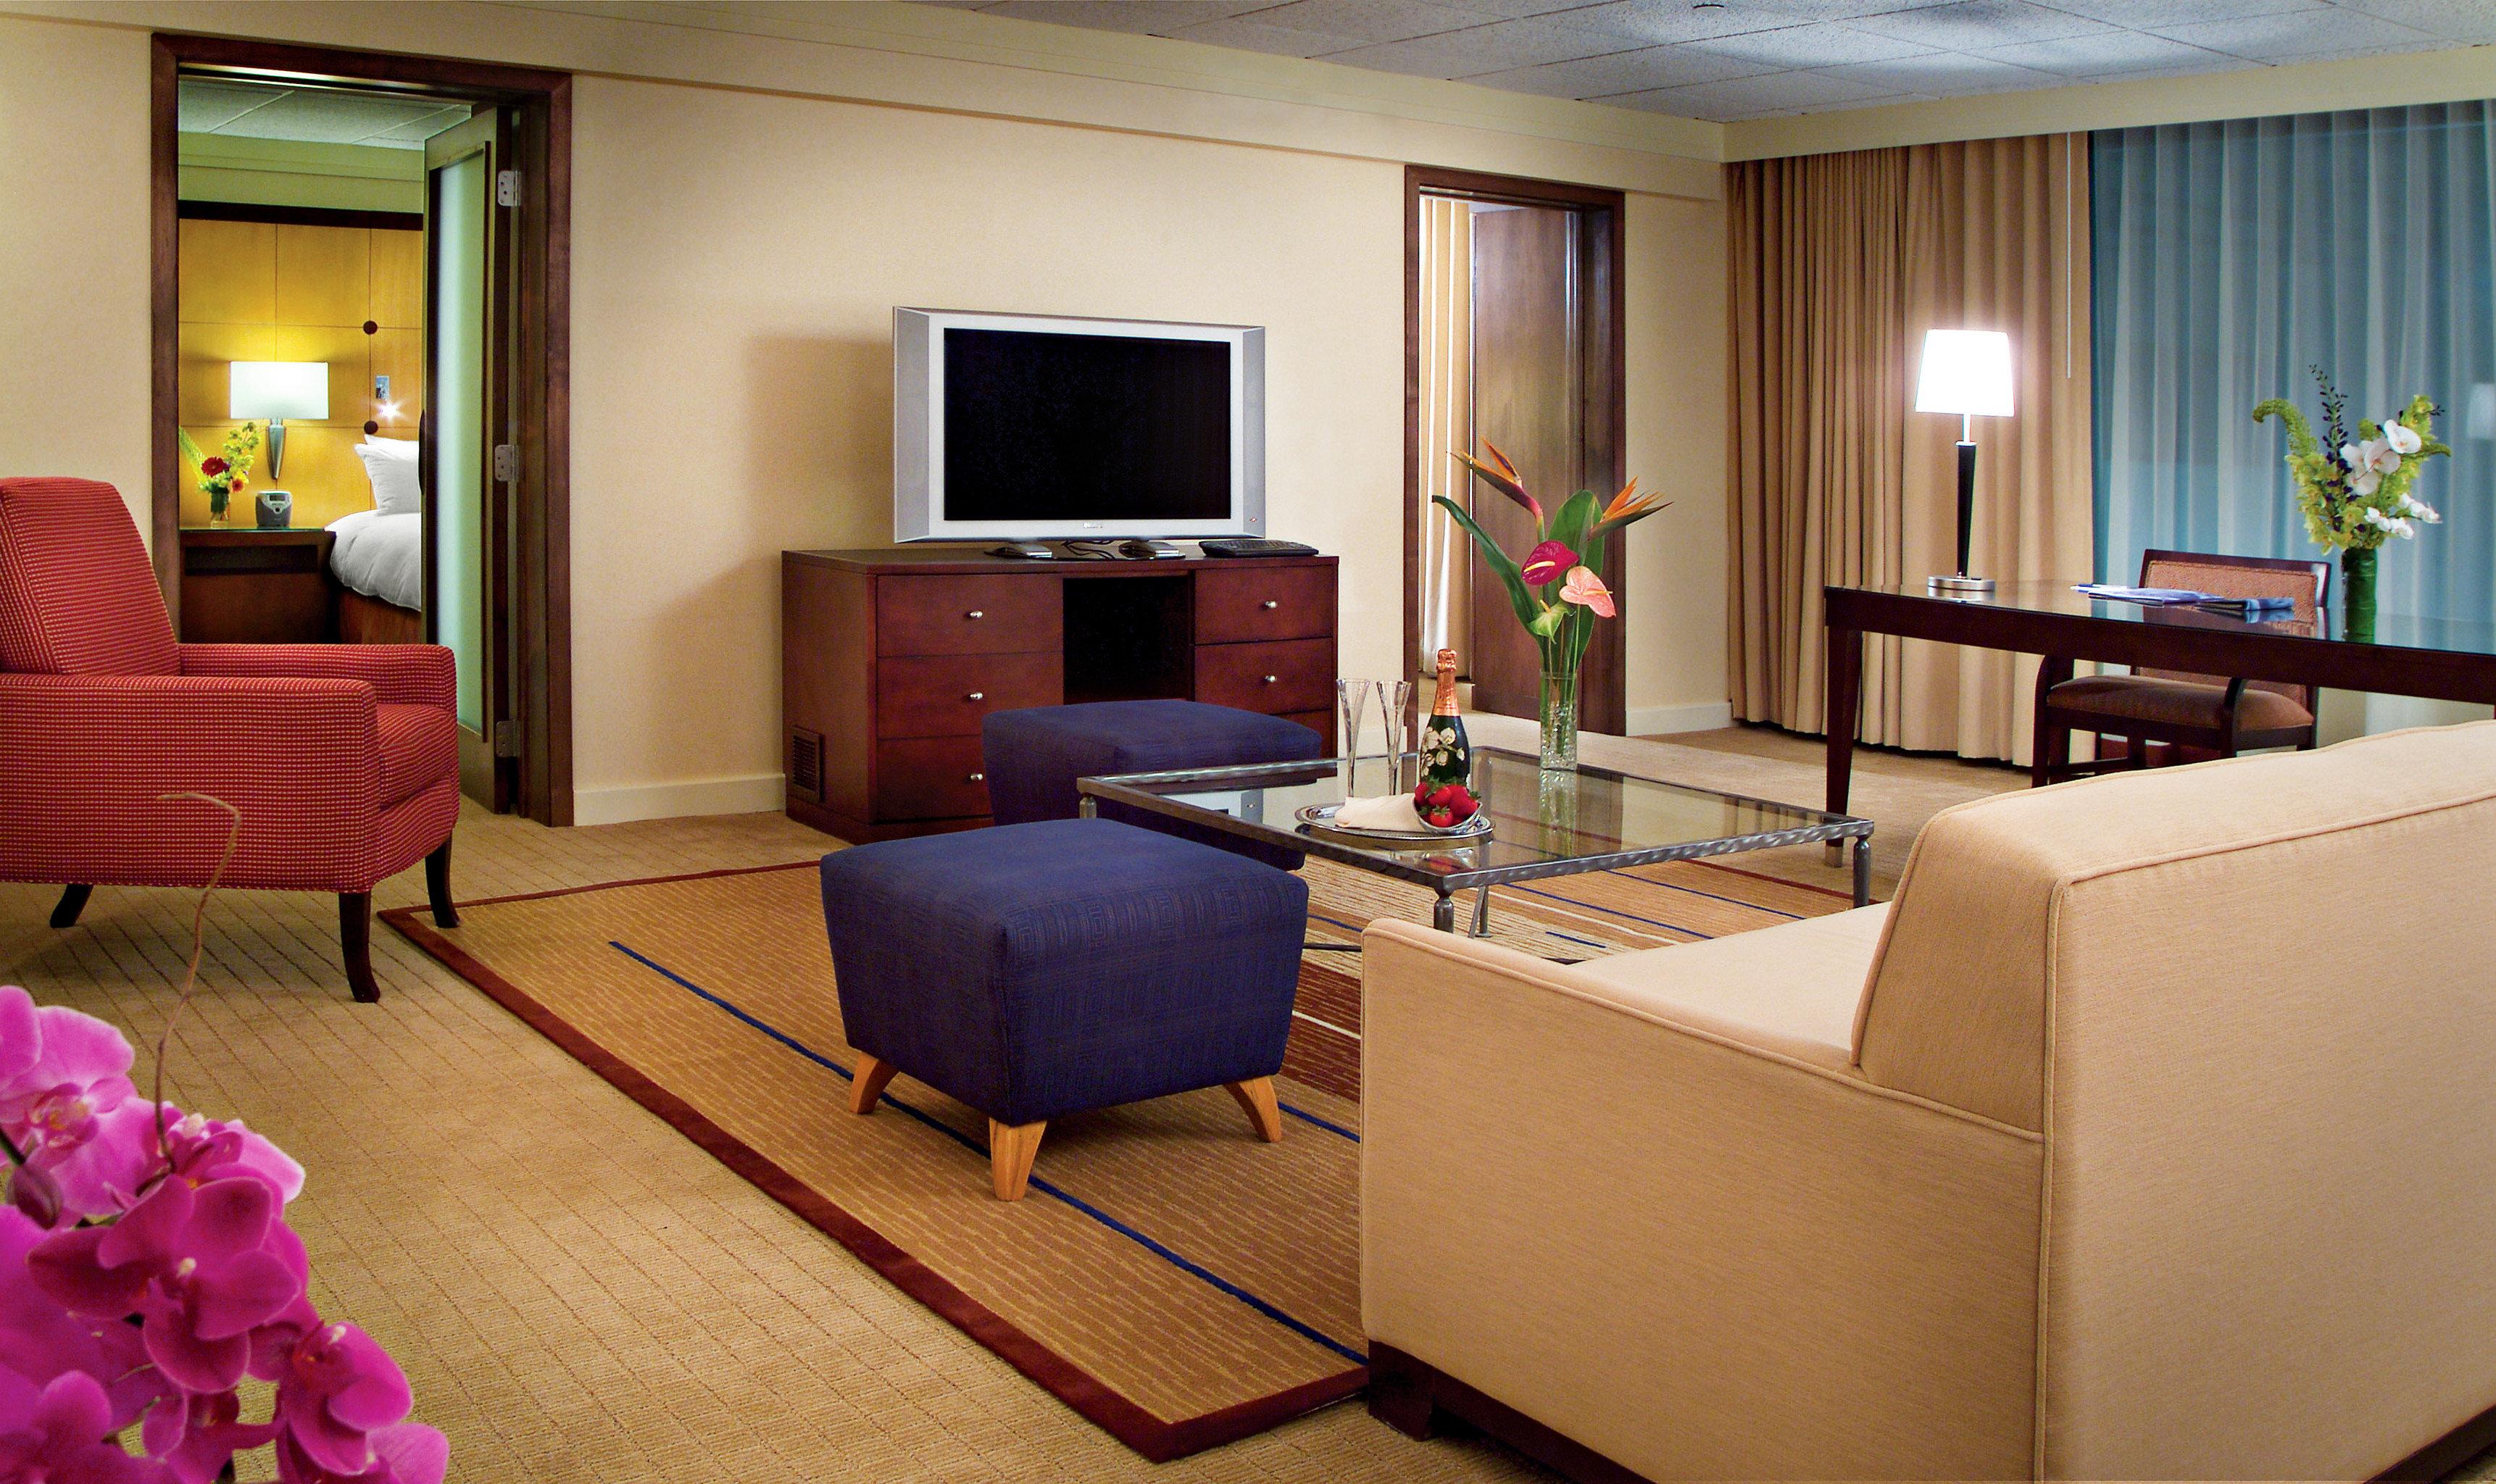 Bedroom Lounge Modern Suite property living room home condominium flat